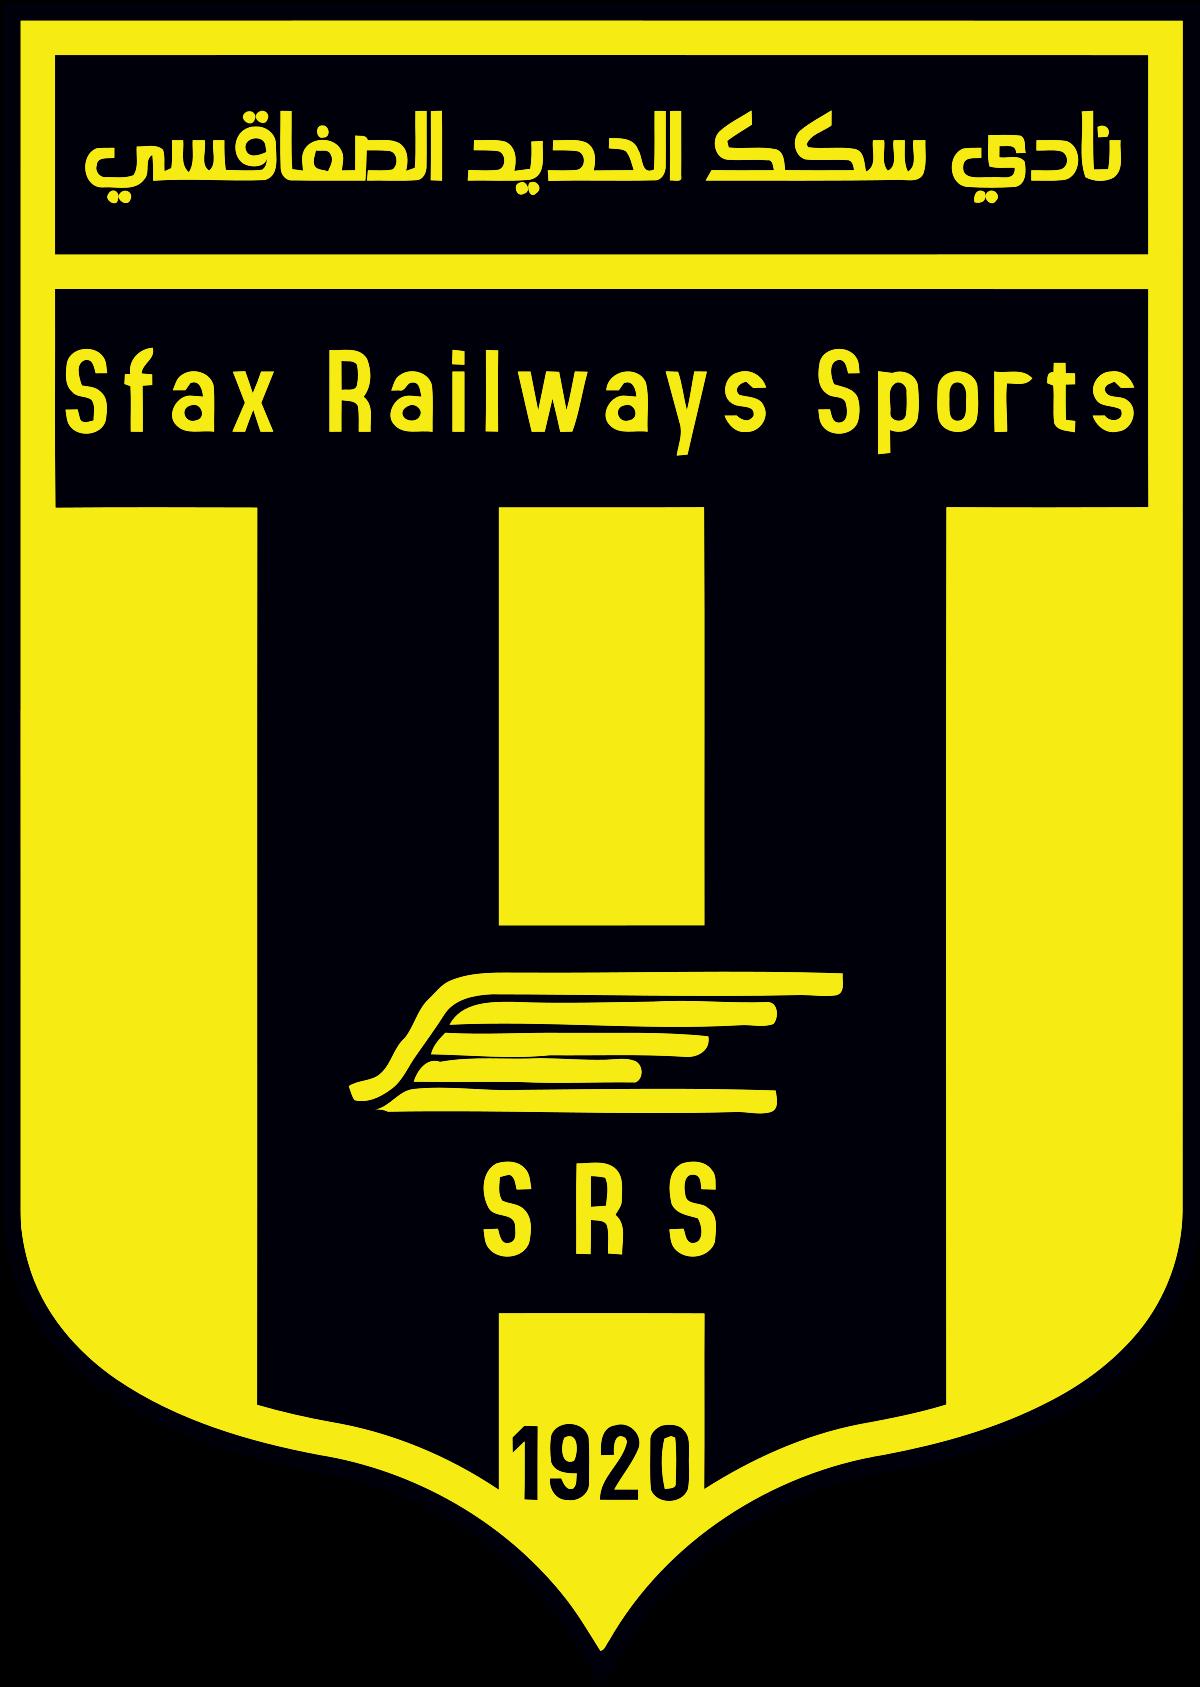 Sfax Railways logo